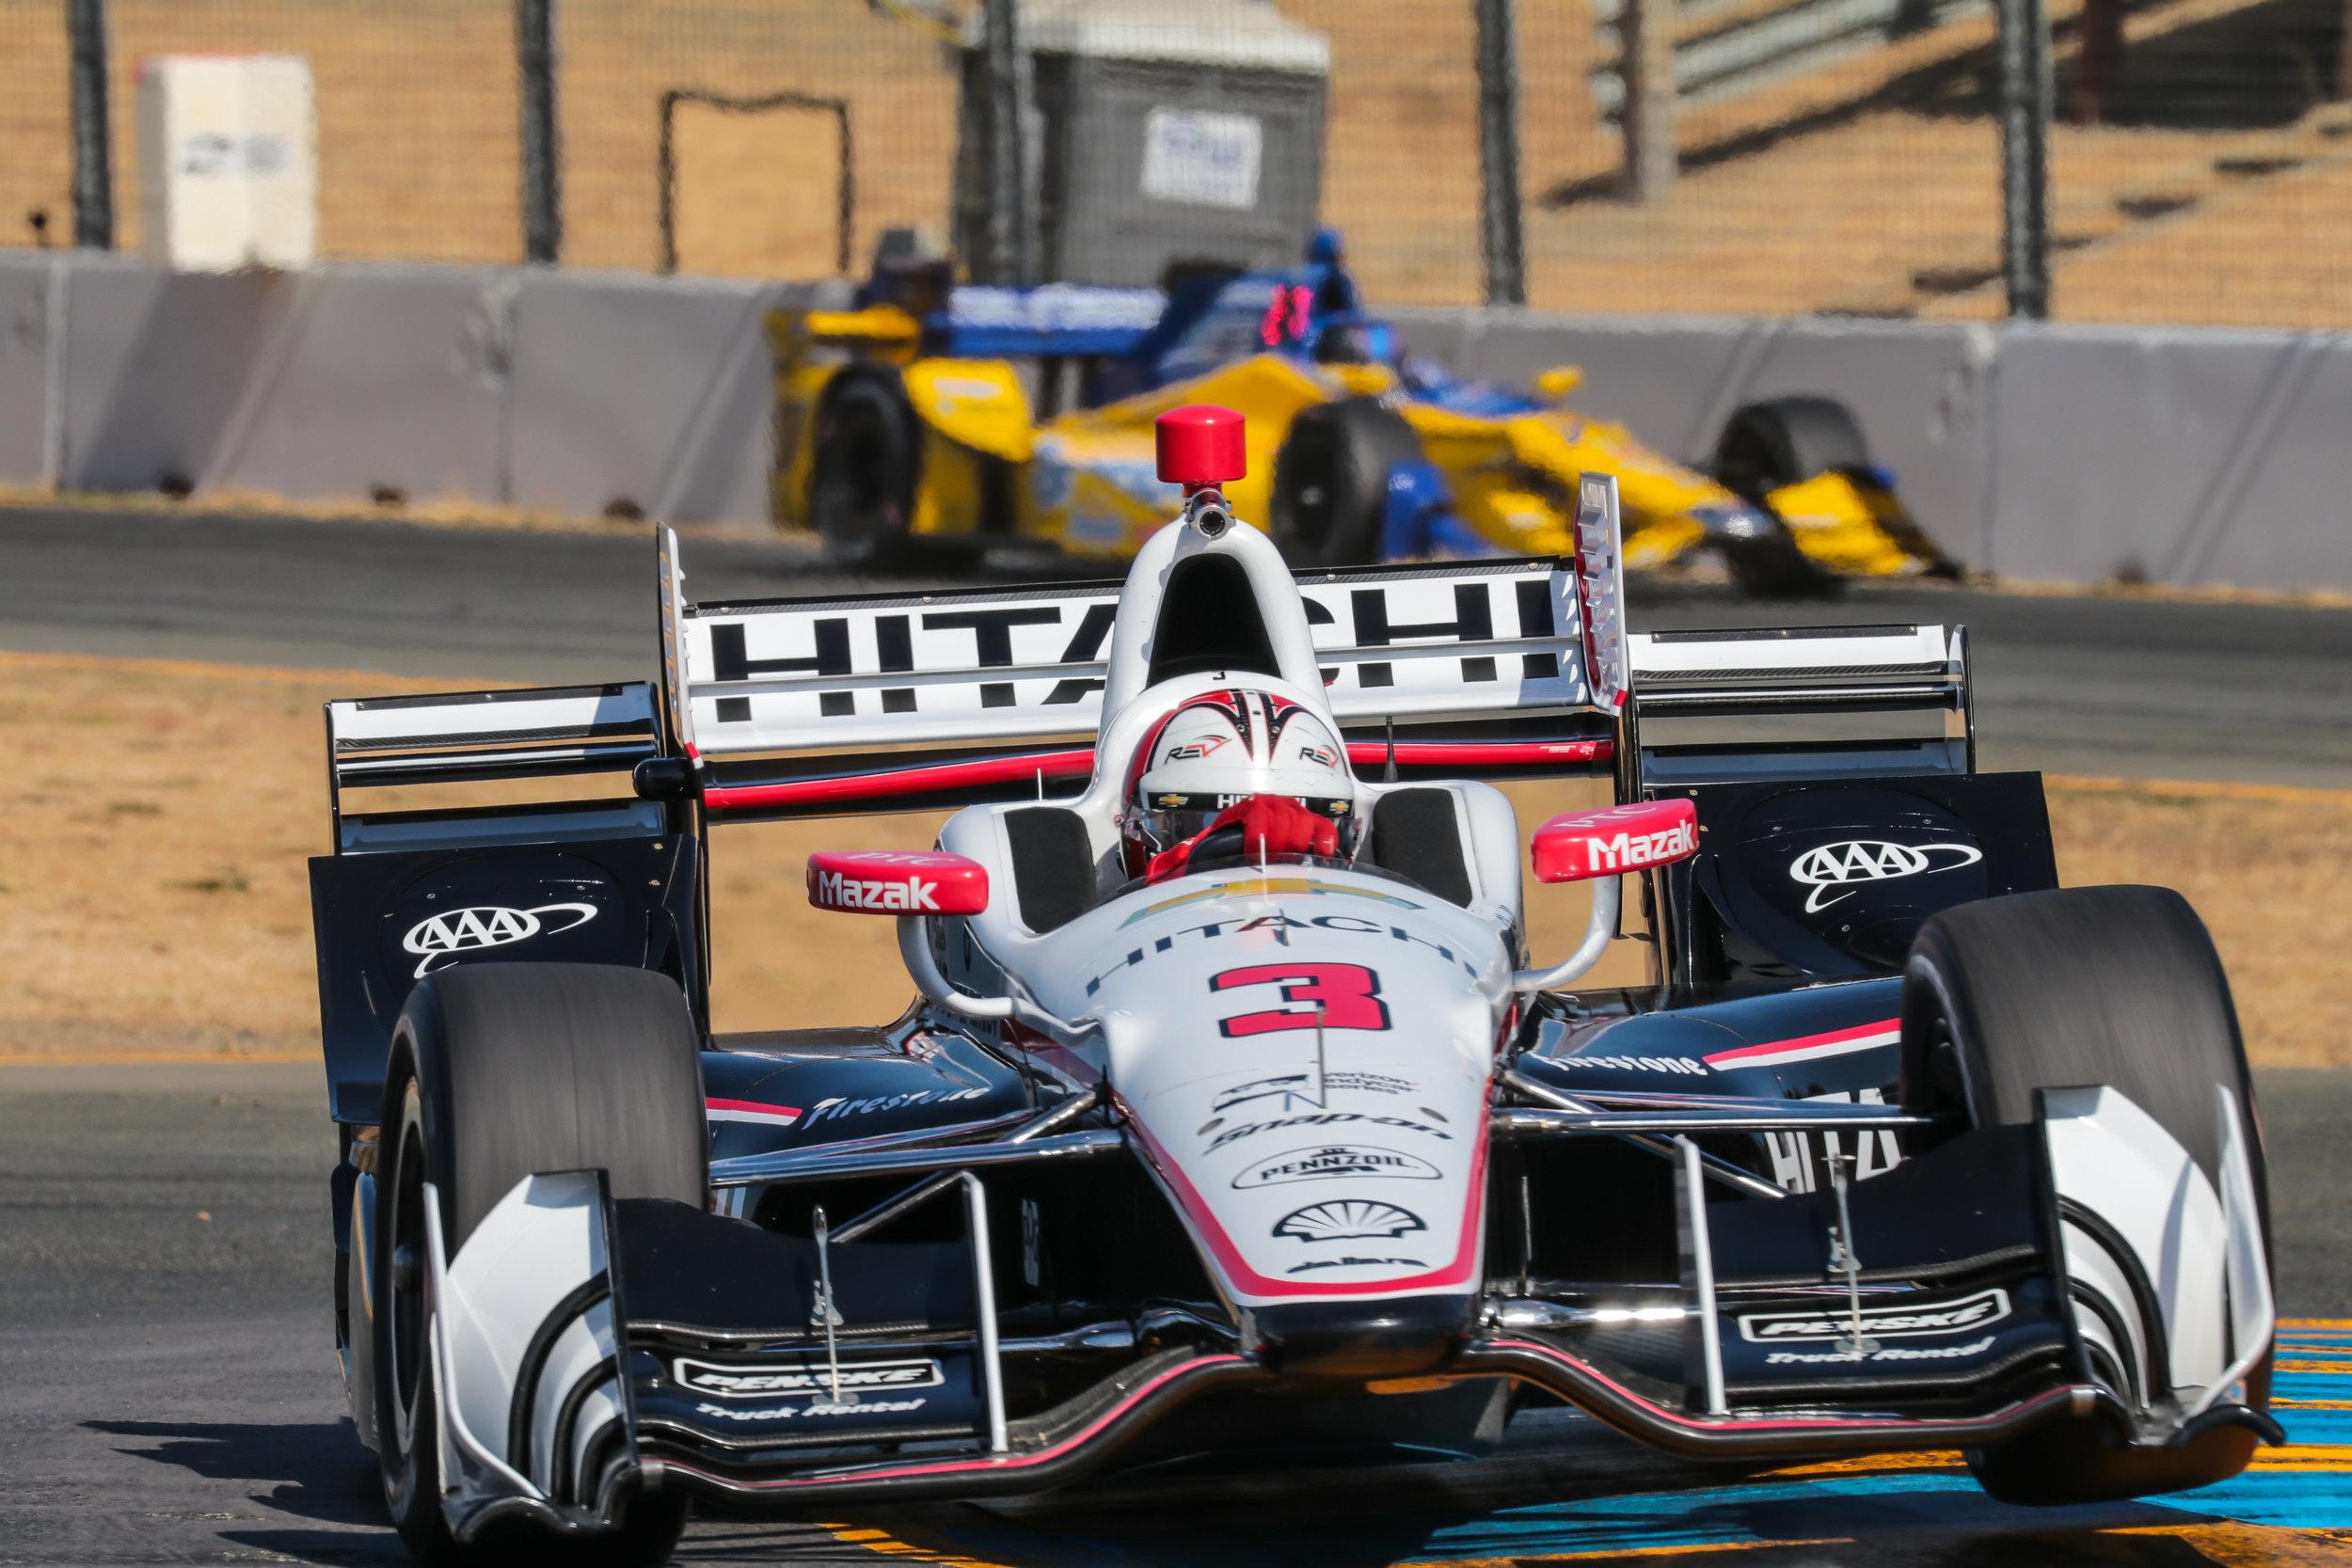 Indy16-2202.jpg